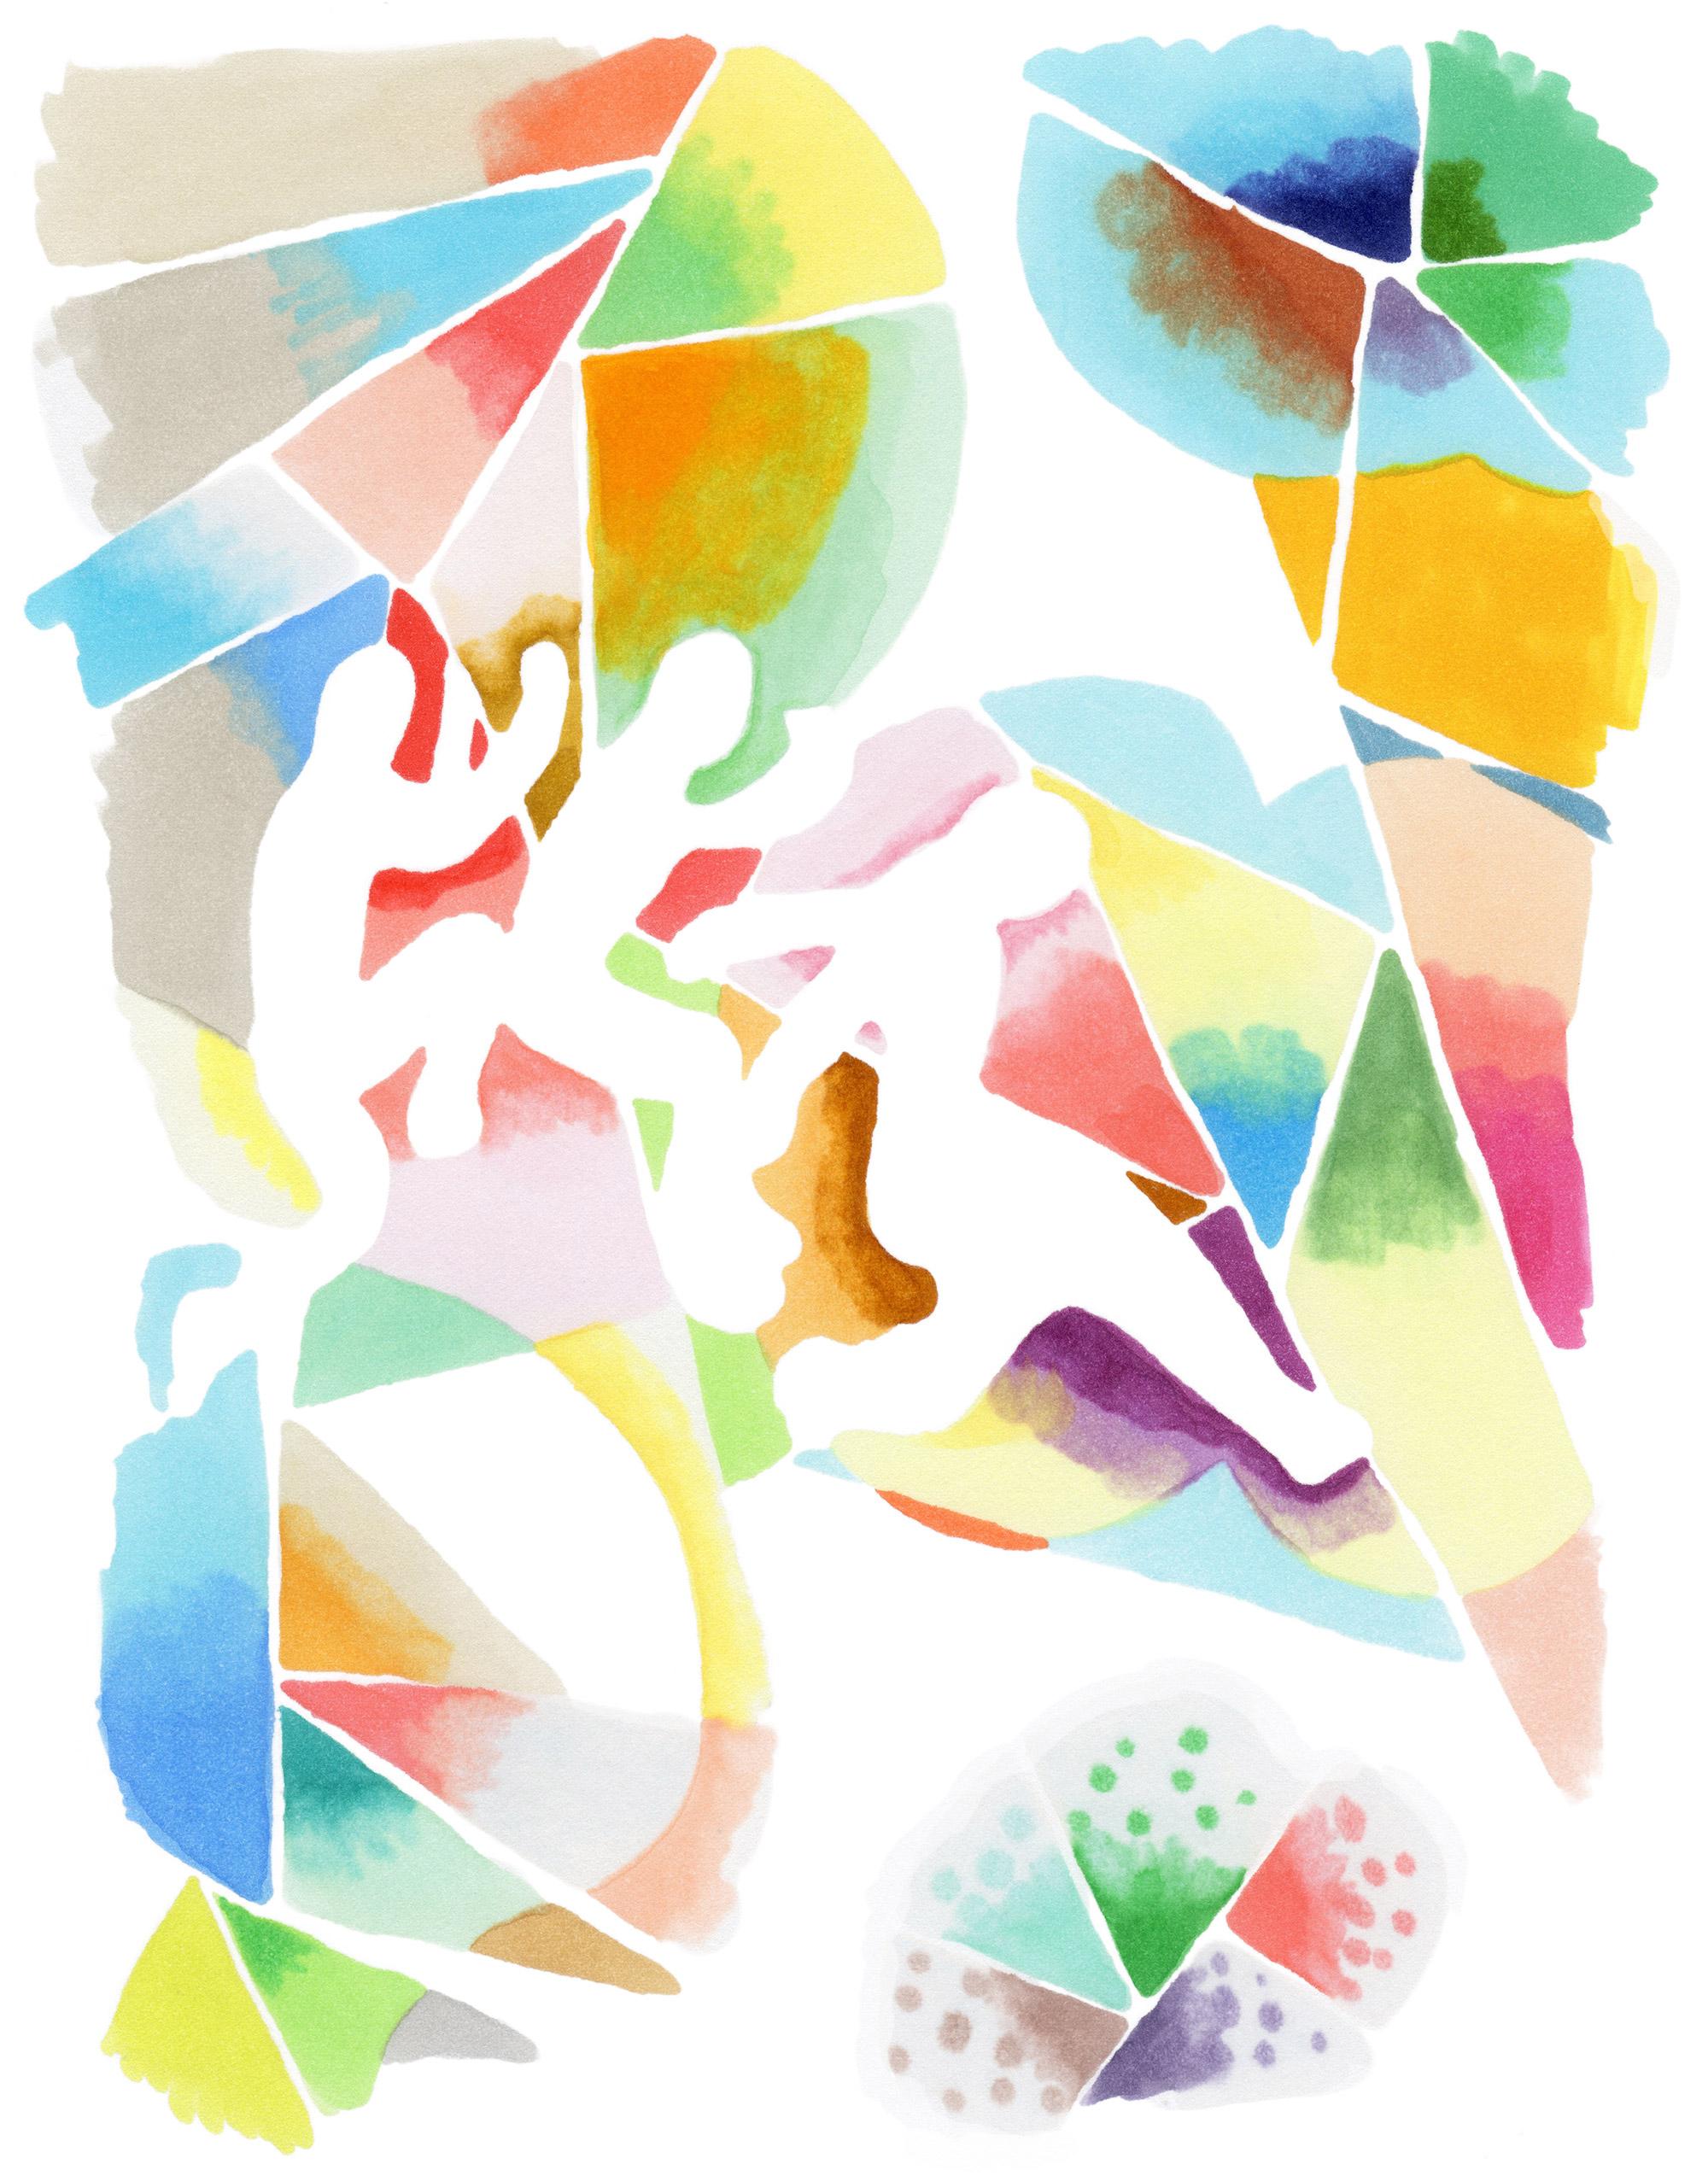 Murgraph_016